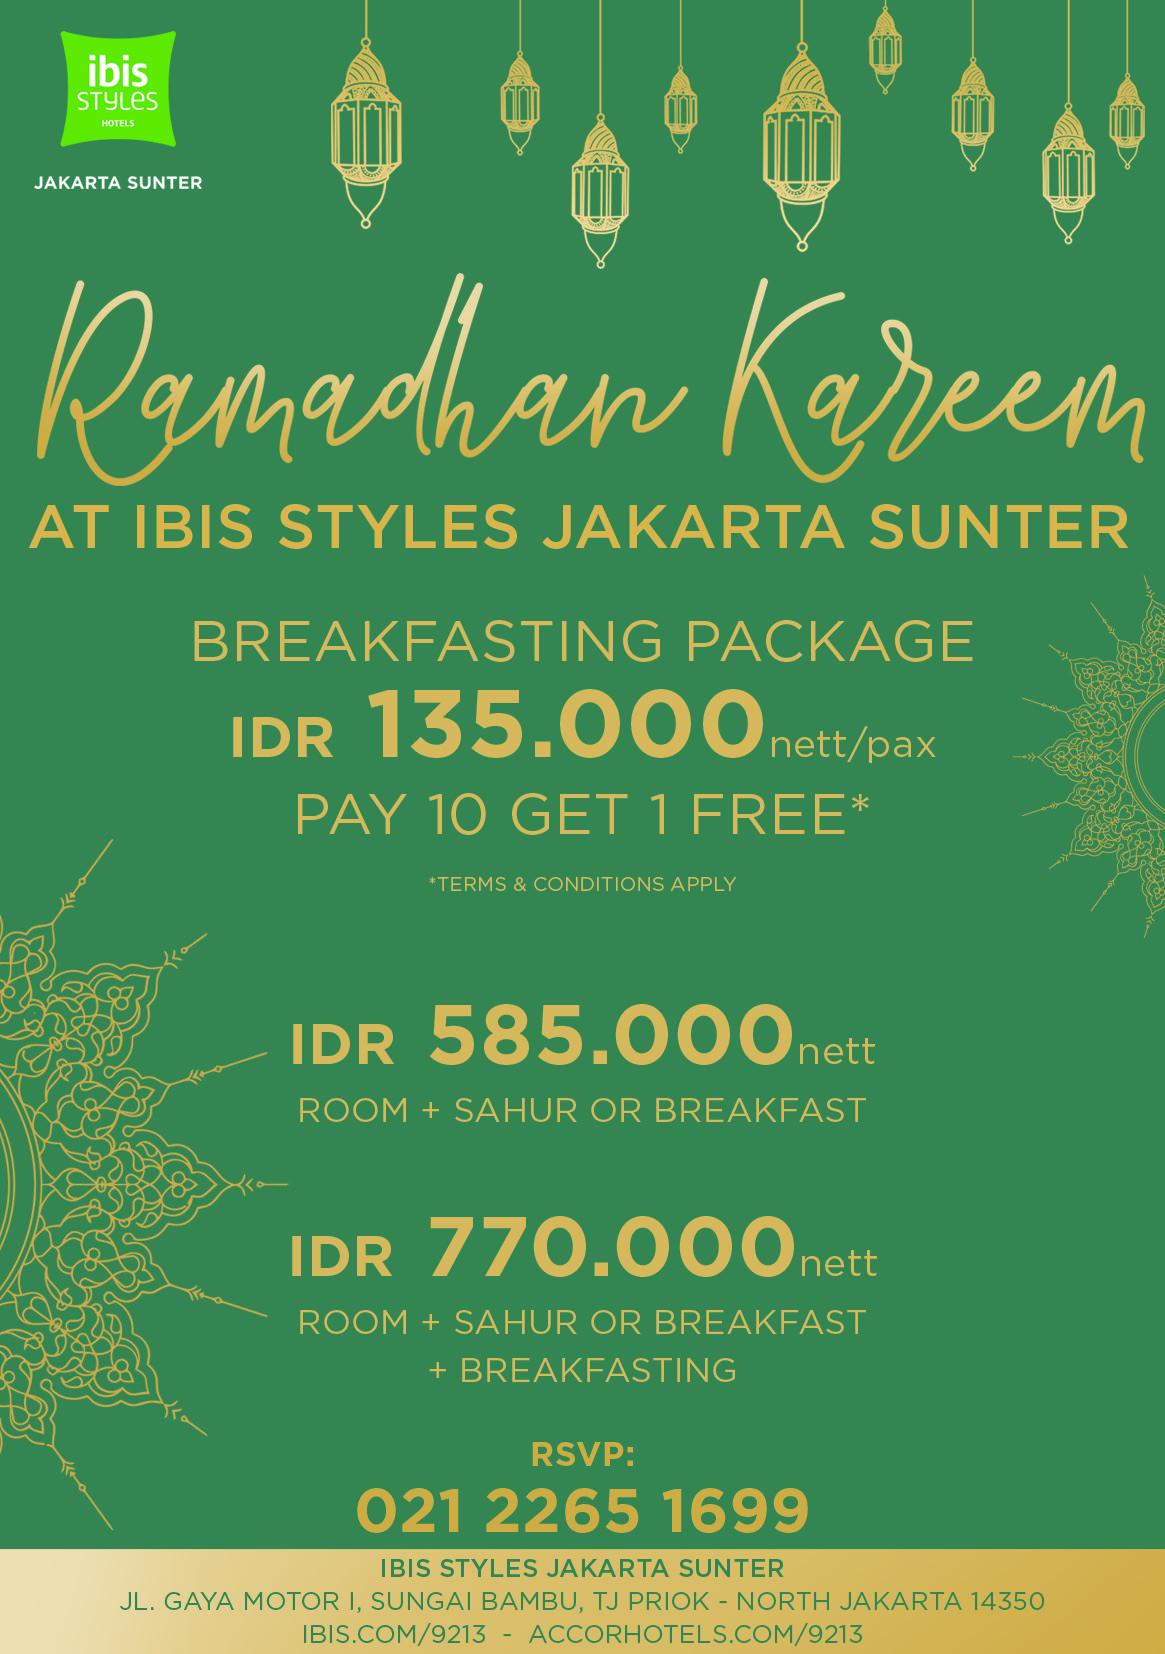 Paket Buka Puasa Di Hotel Jakarta 2019 : paket, puasa, hotel, jakarta, Jelang, Ramadan,, Styles, Jakarta, Sunter, Tawarkan, Paket, Bukber, Spesial, Tribunnews.com, Mobile